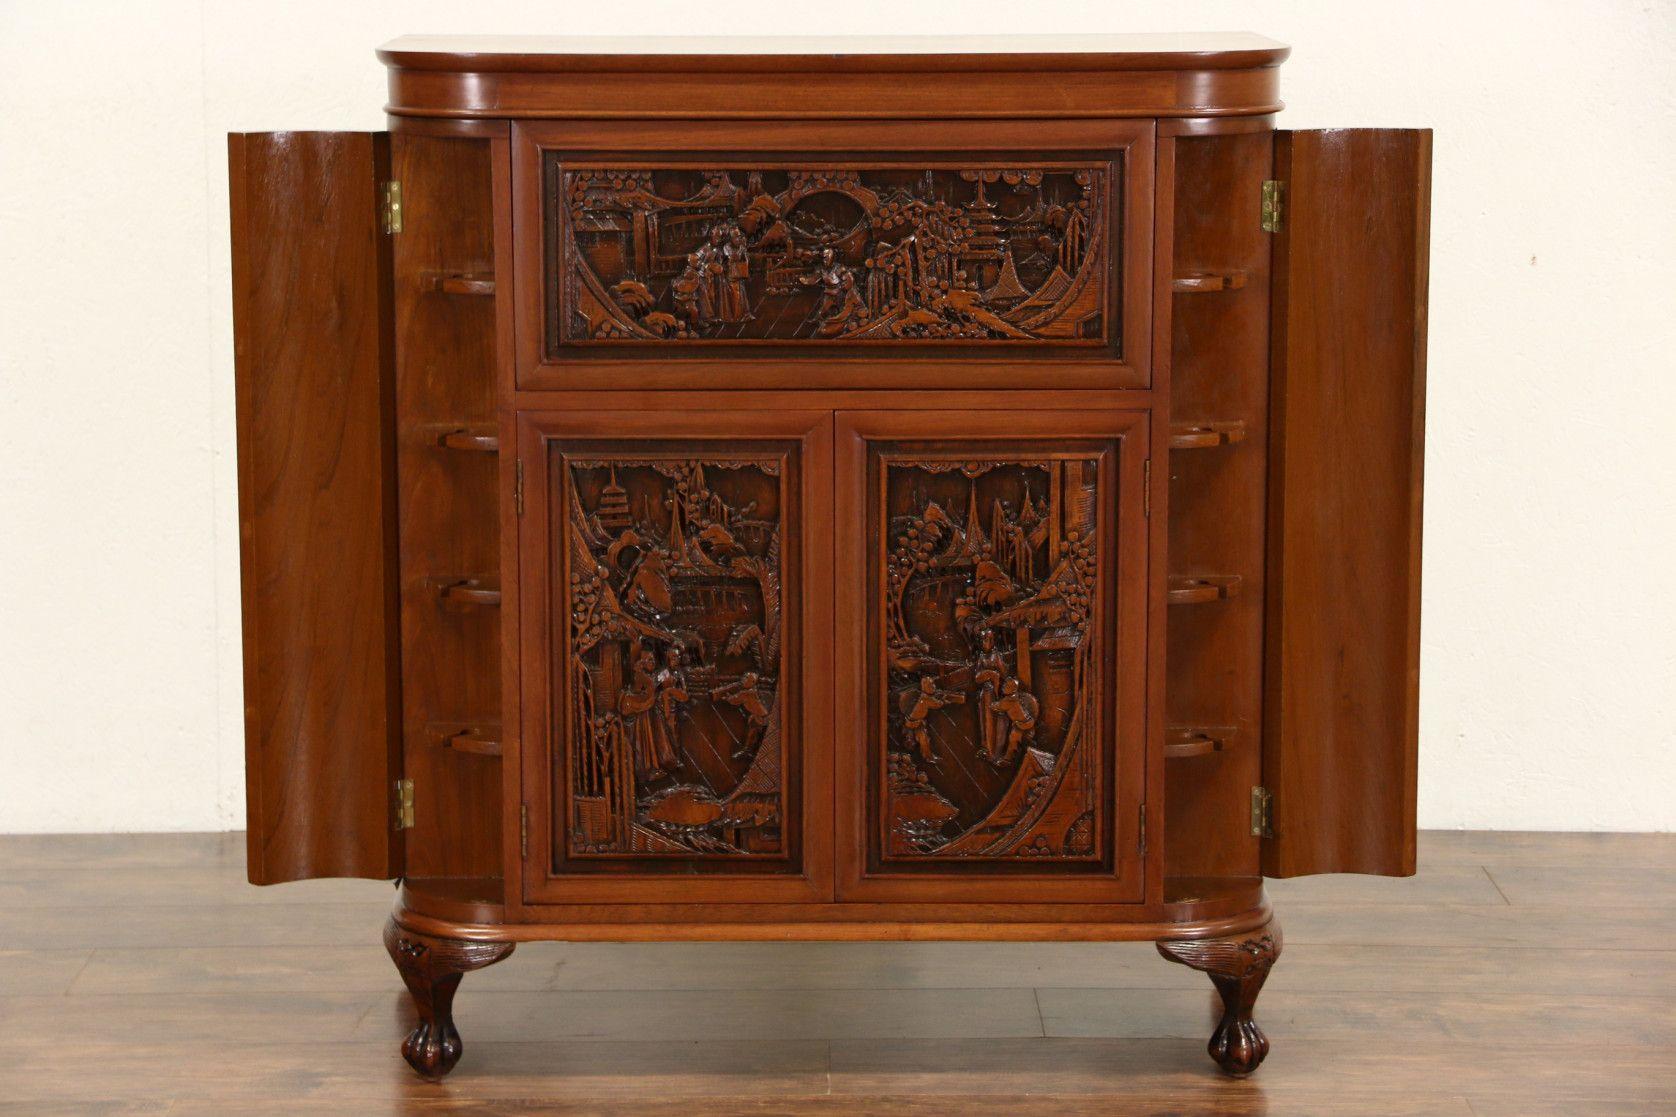 Pin Rahayu12 On Interior Analogi Liquor Cabinet with regard to dimensions 1676 X 1117